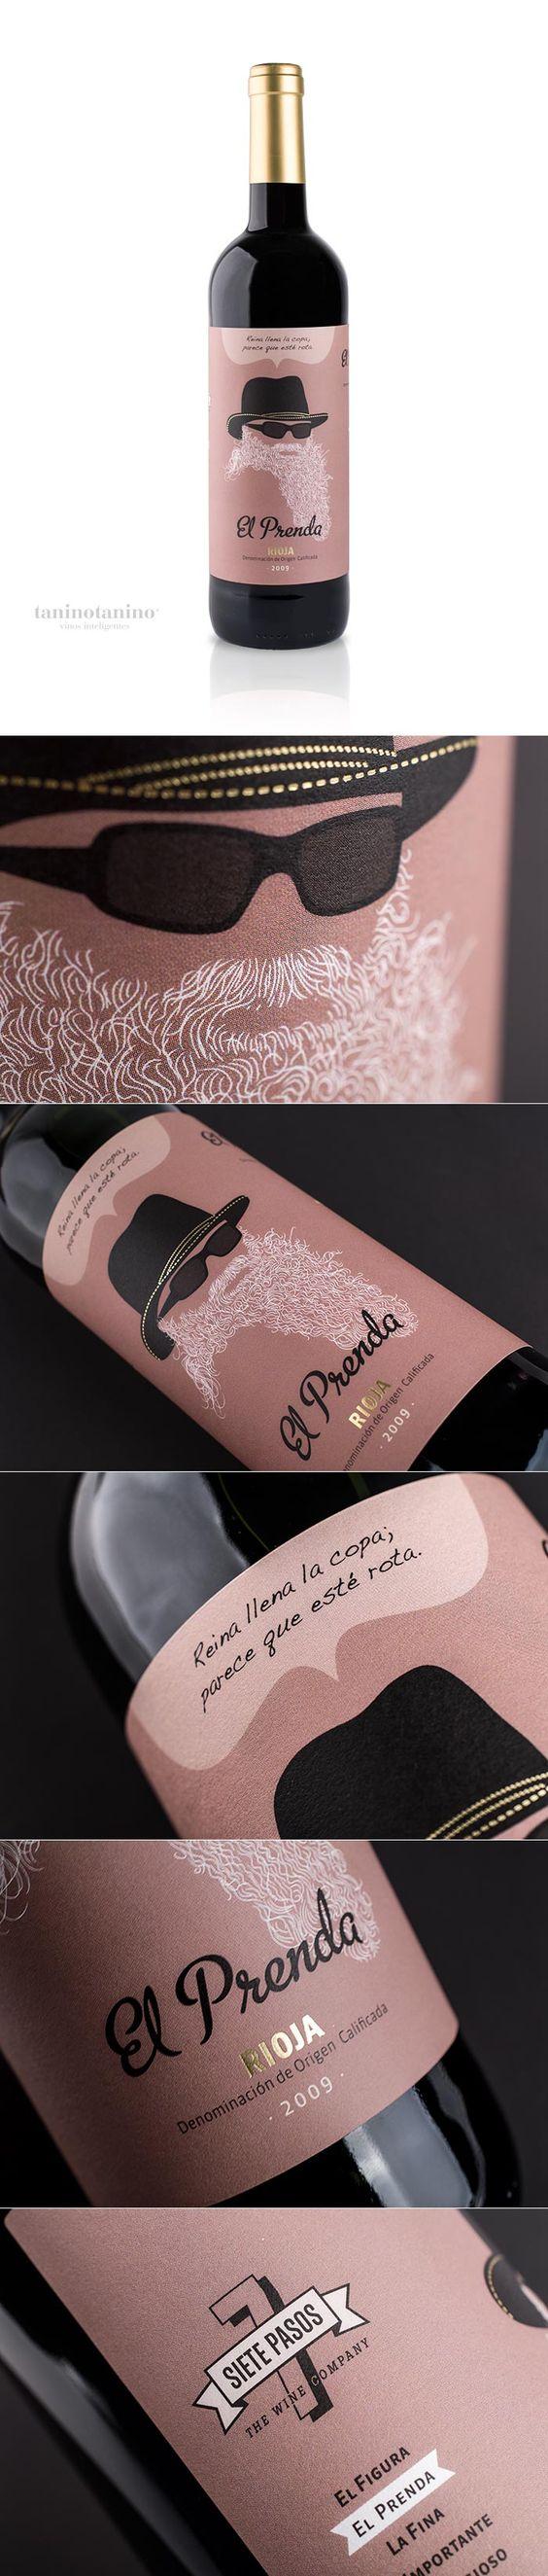 EL PRENDA SIETE PASOS  wine / vinho / vino mxm #packaging  #wine #illustration